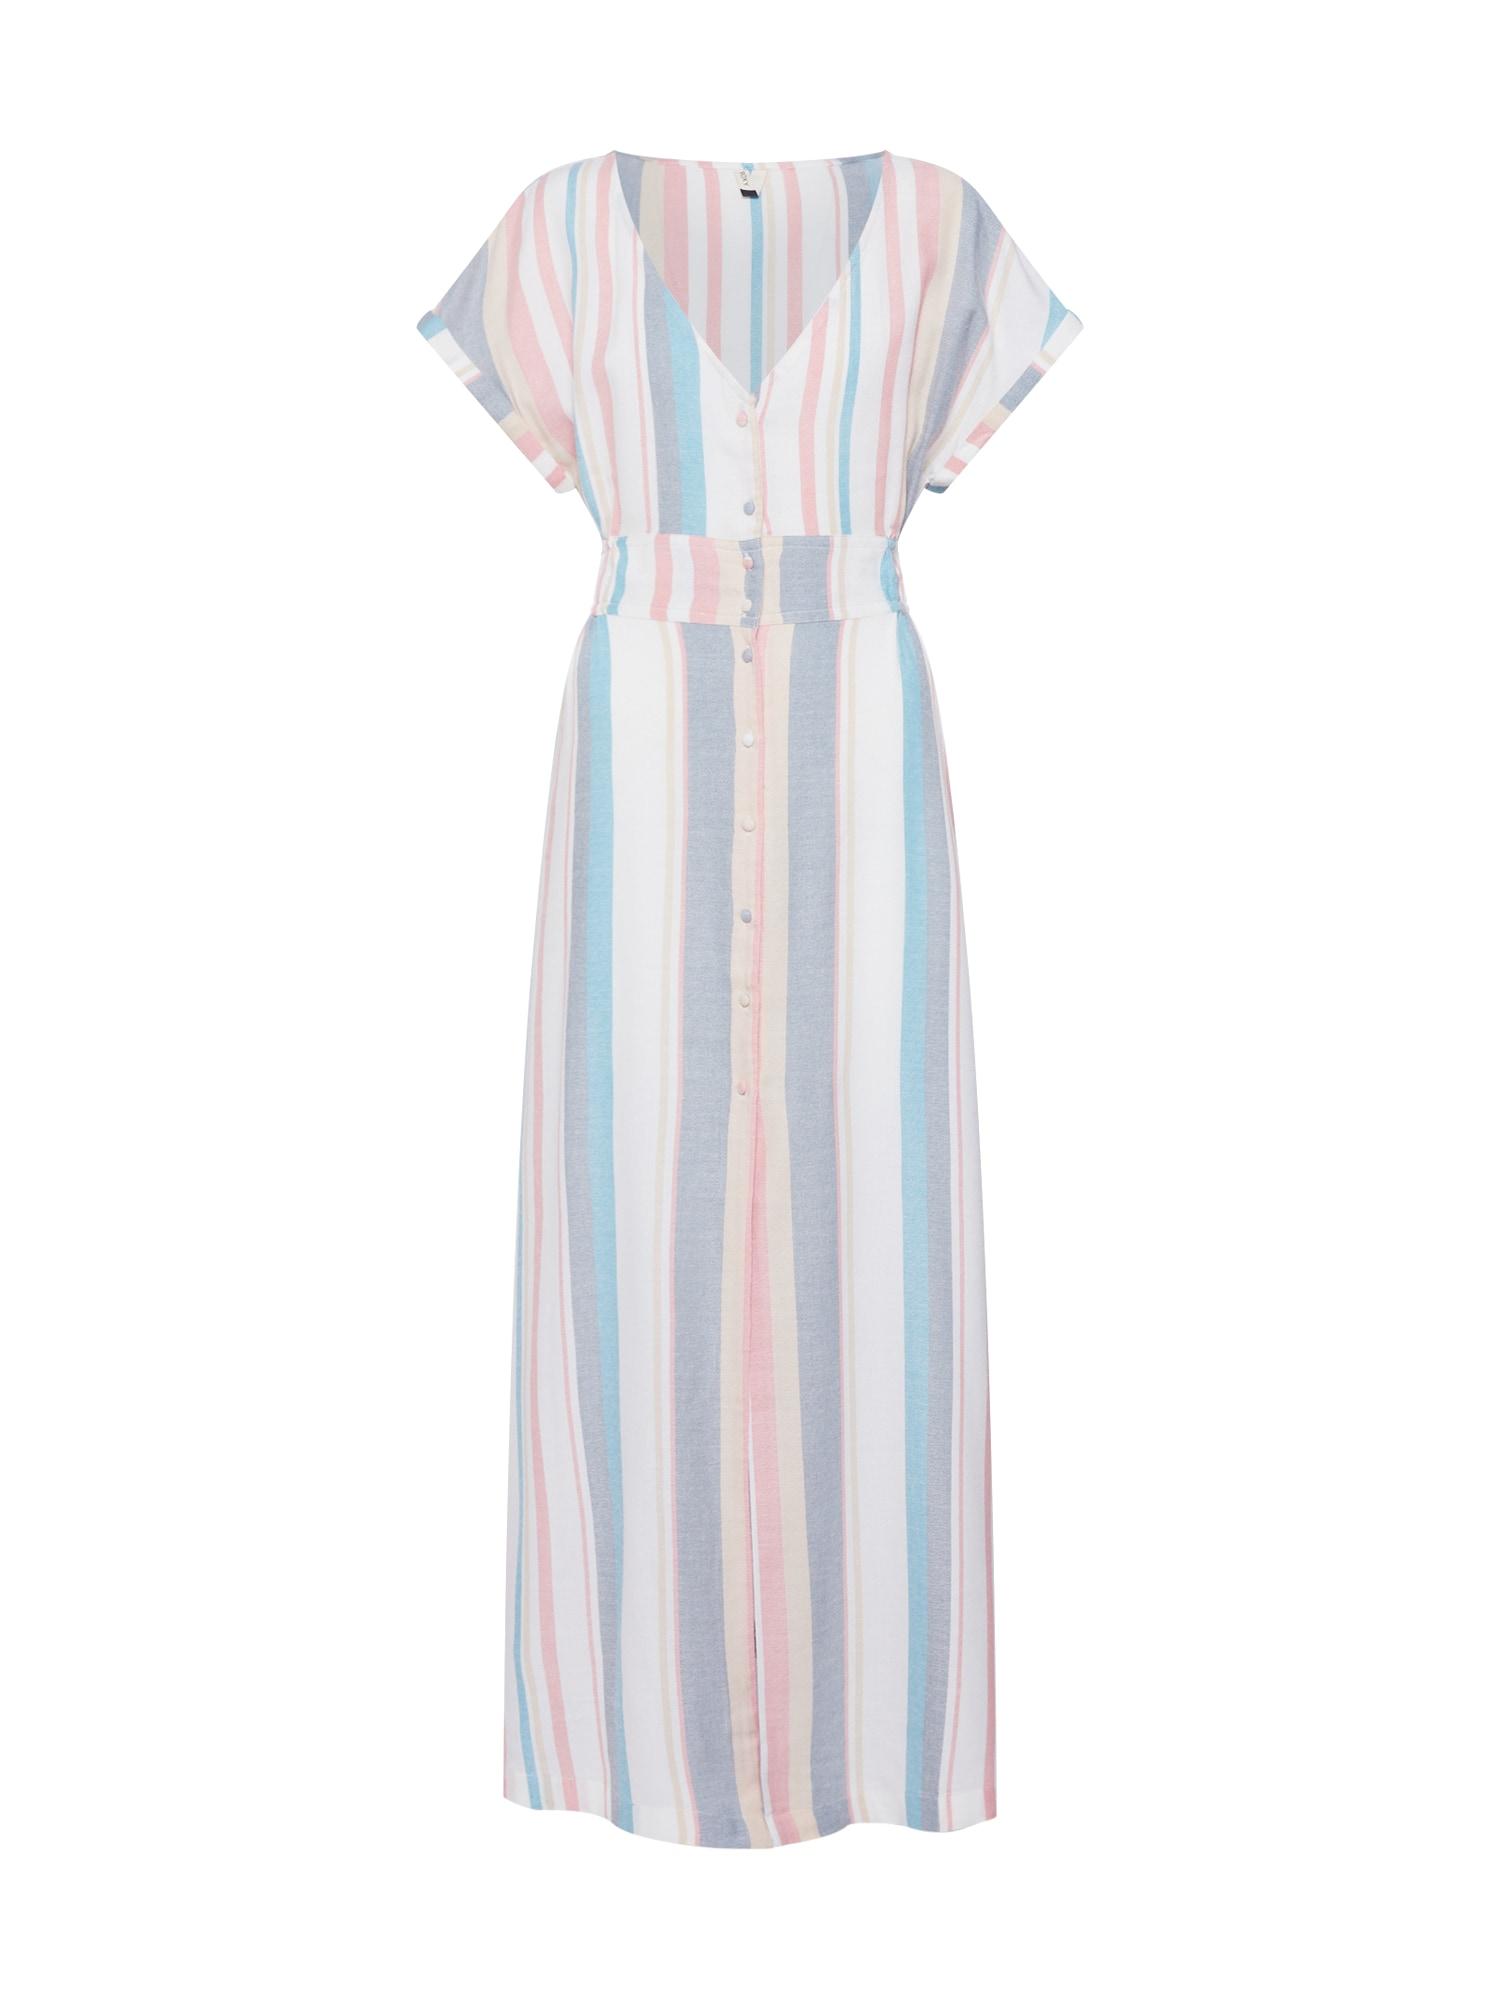 Letní šaty FURORLAGOON mix barev bílá ROXY